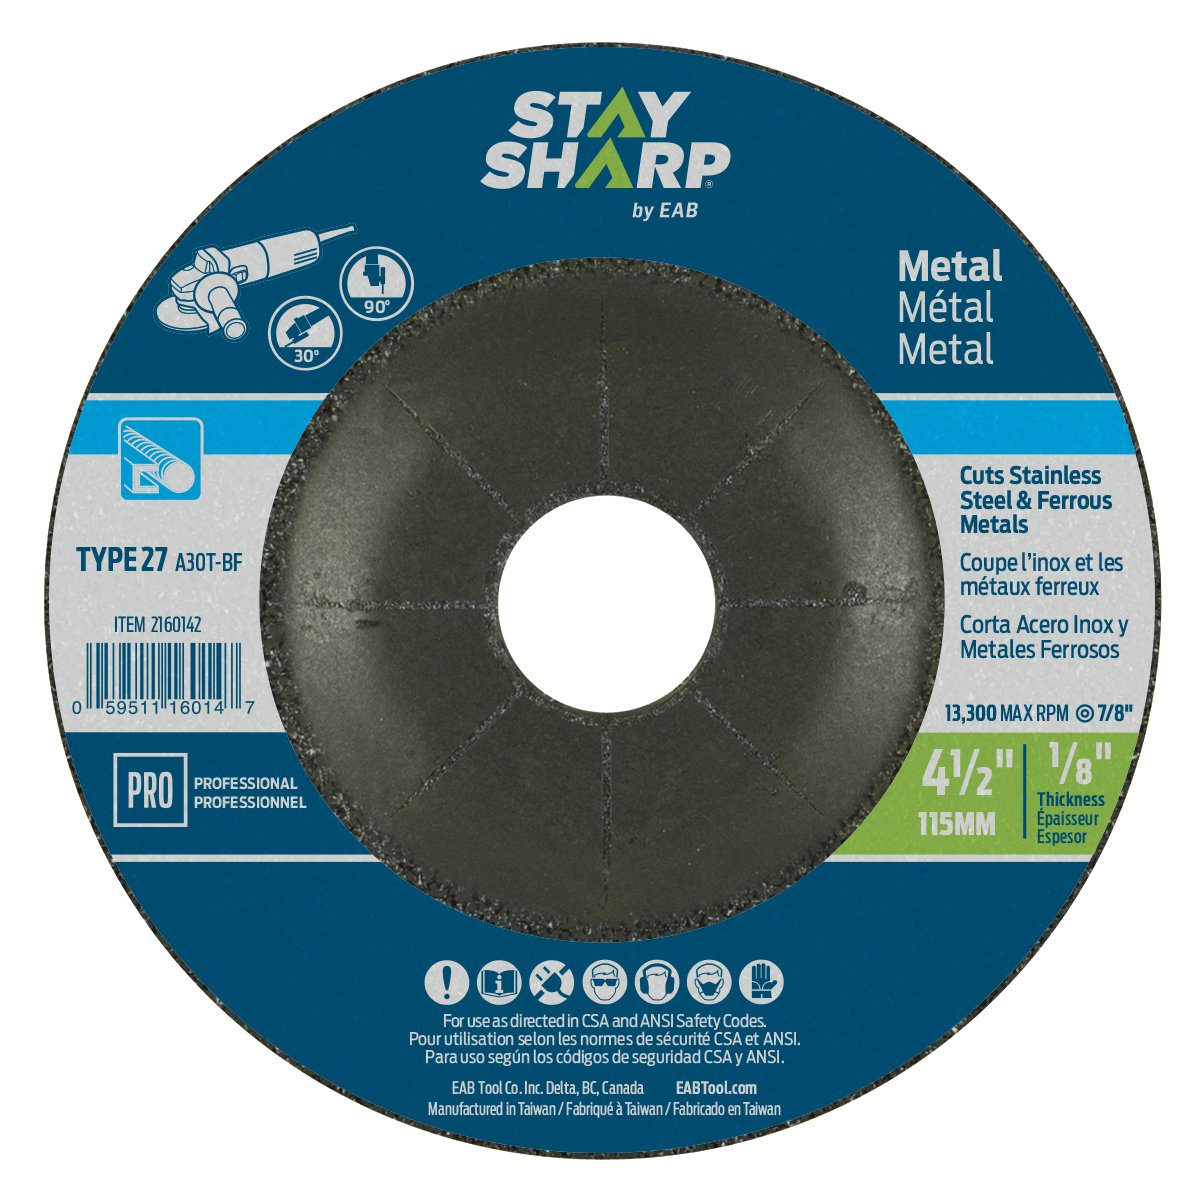 EAB Tool 2160142 4 1/2 x 1/8' Standard Metal Depressed Center Wheel EAB Tool Company USA Inc